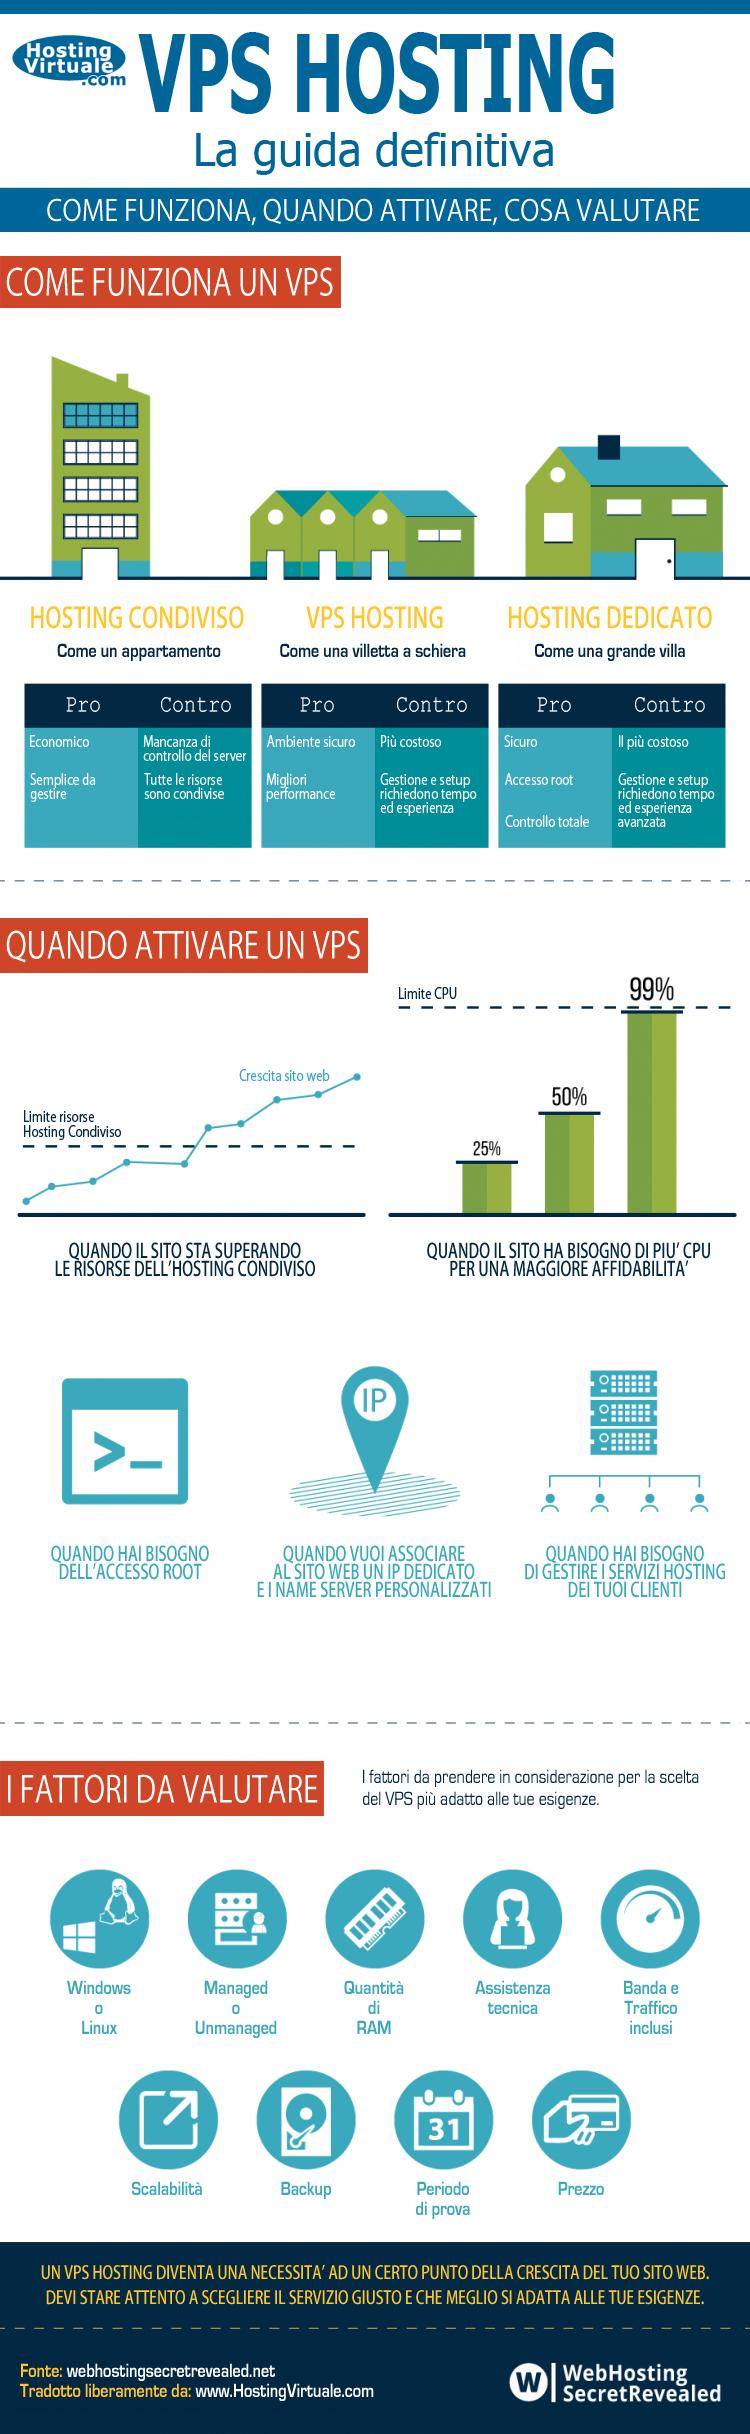 Infografica VPS Hosting La guida definitiva